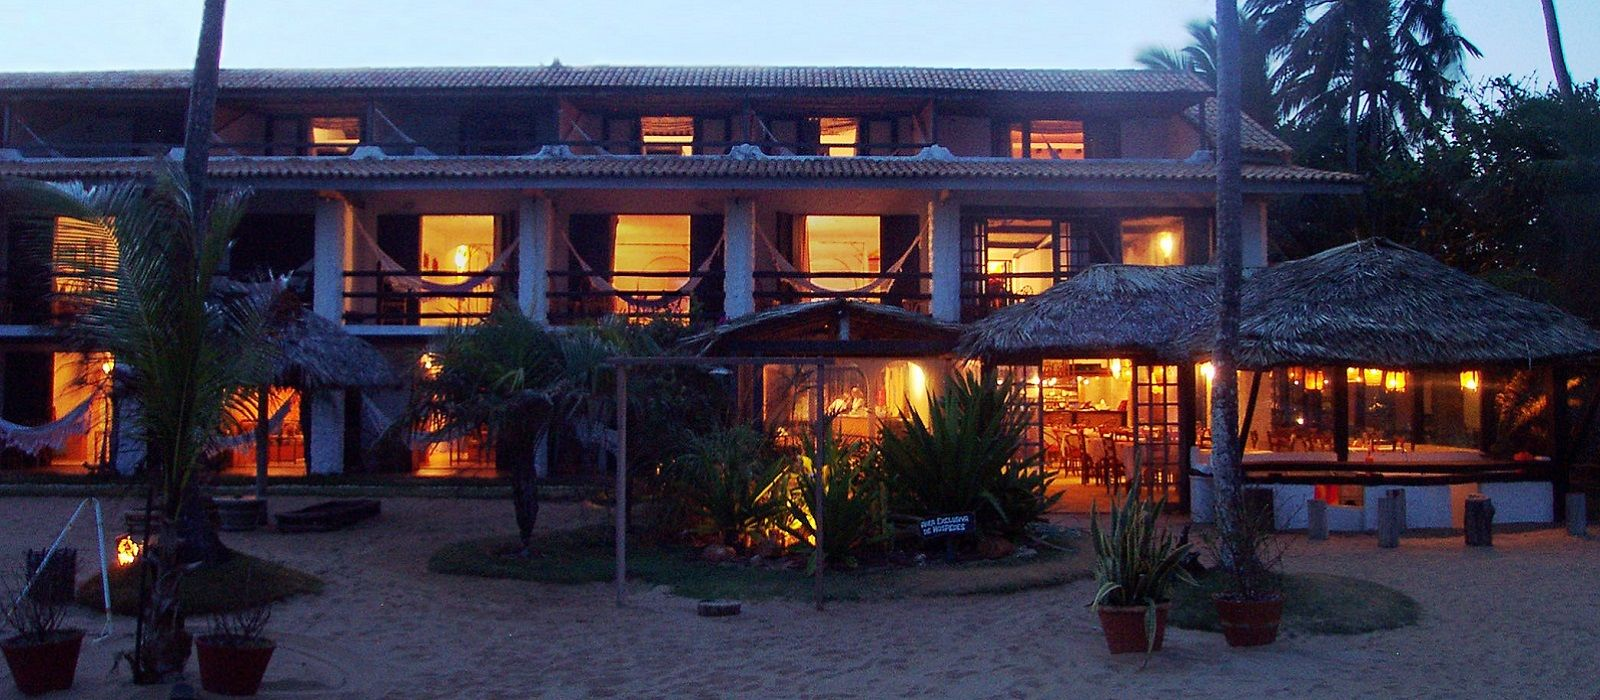 Hotel Porto da Lua Pousada Brasilien